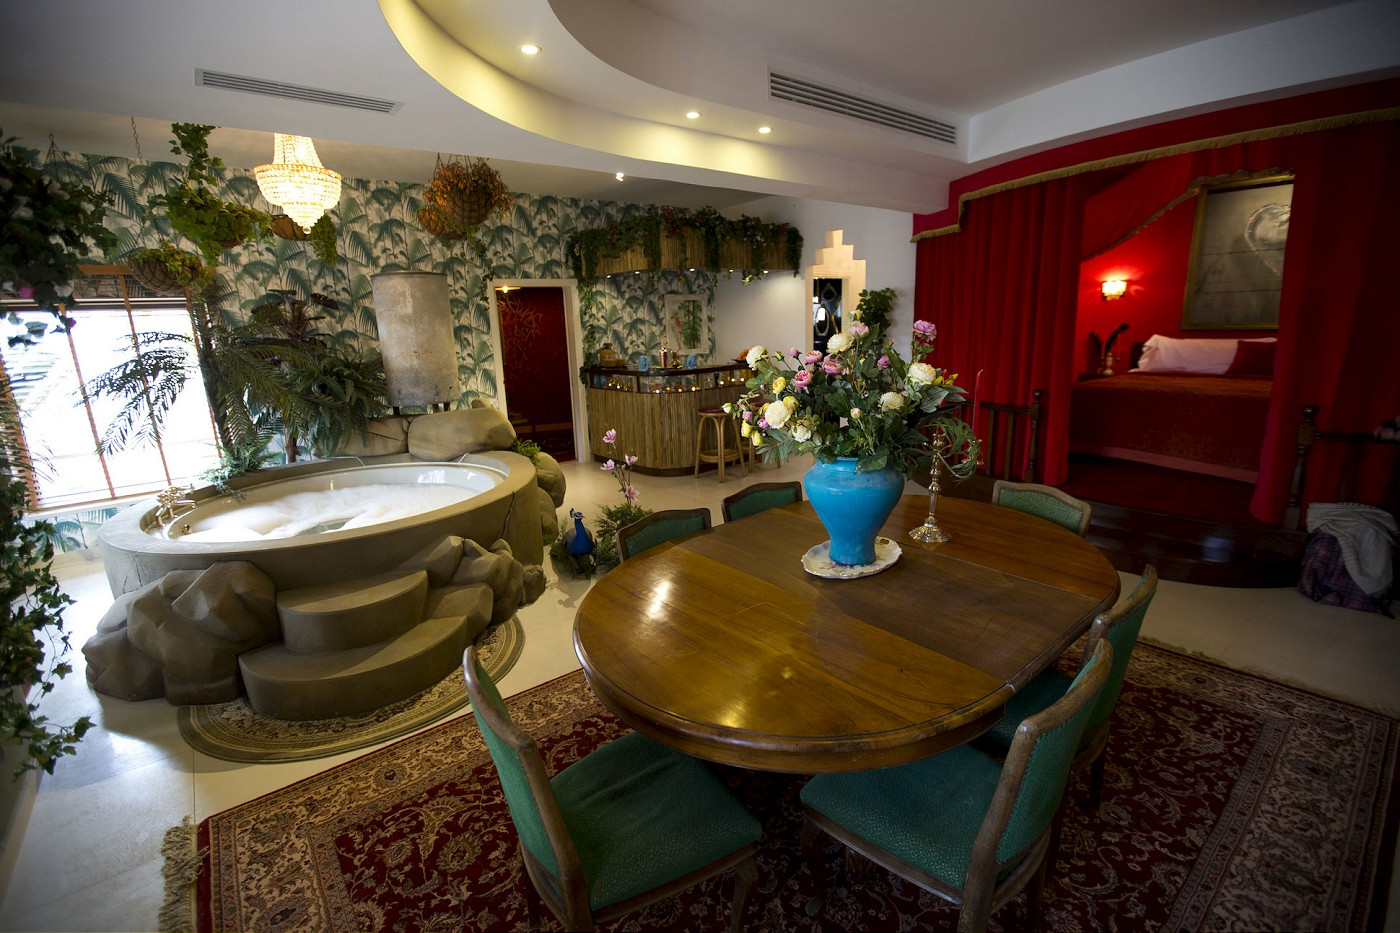 banksy-hotel4.jpg